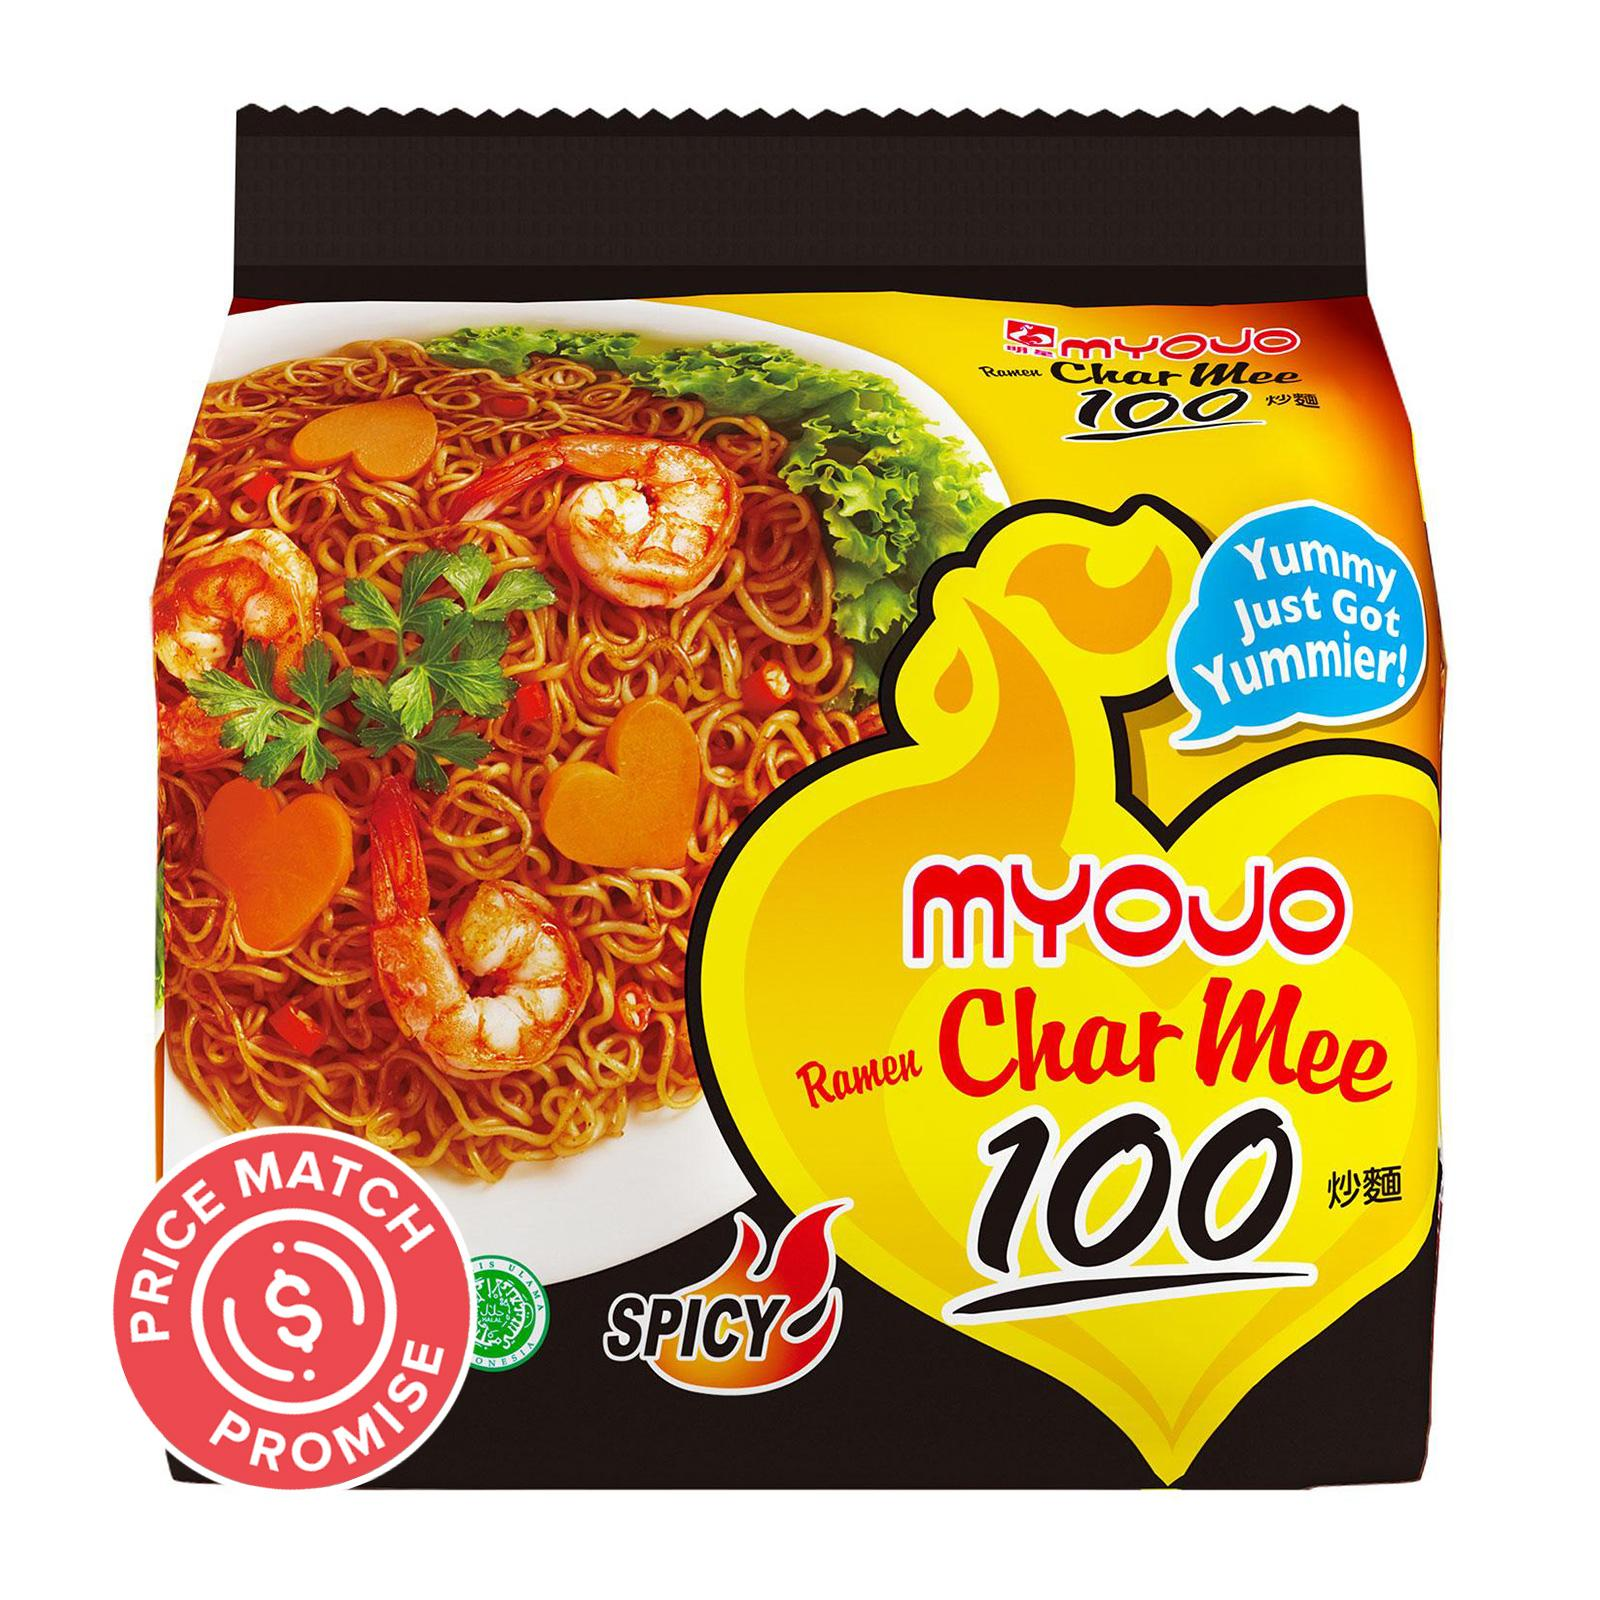 Myojo Ramen Char Mee 100 Dry Noodle | Lazada Singapore